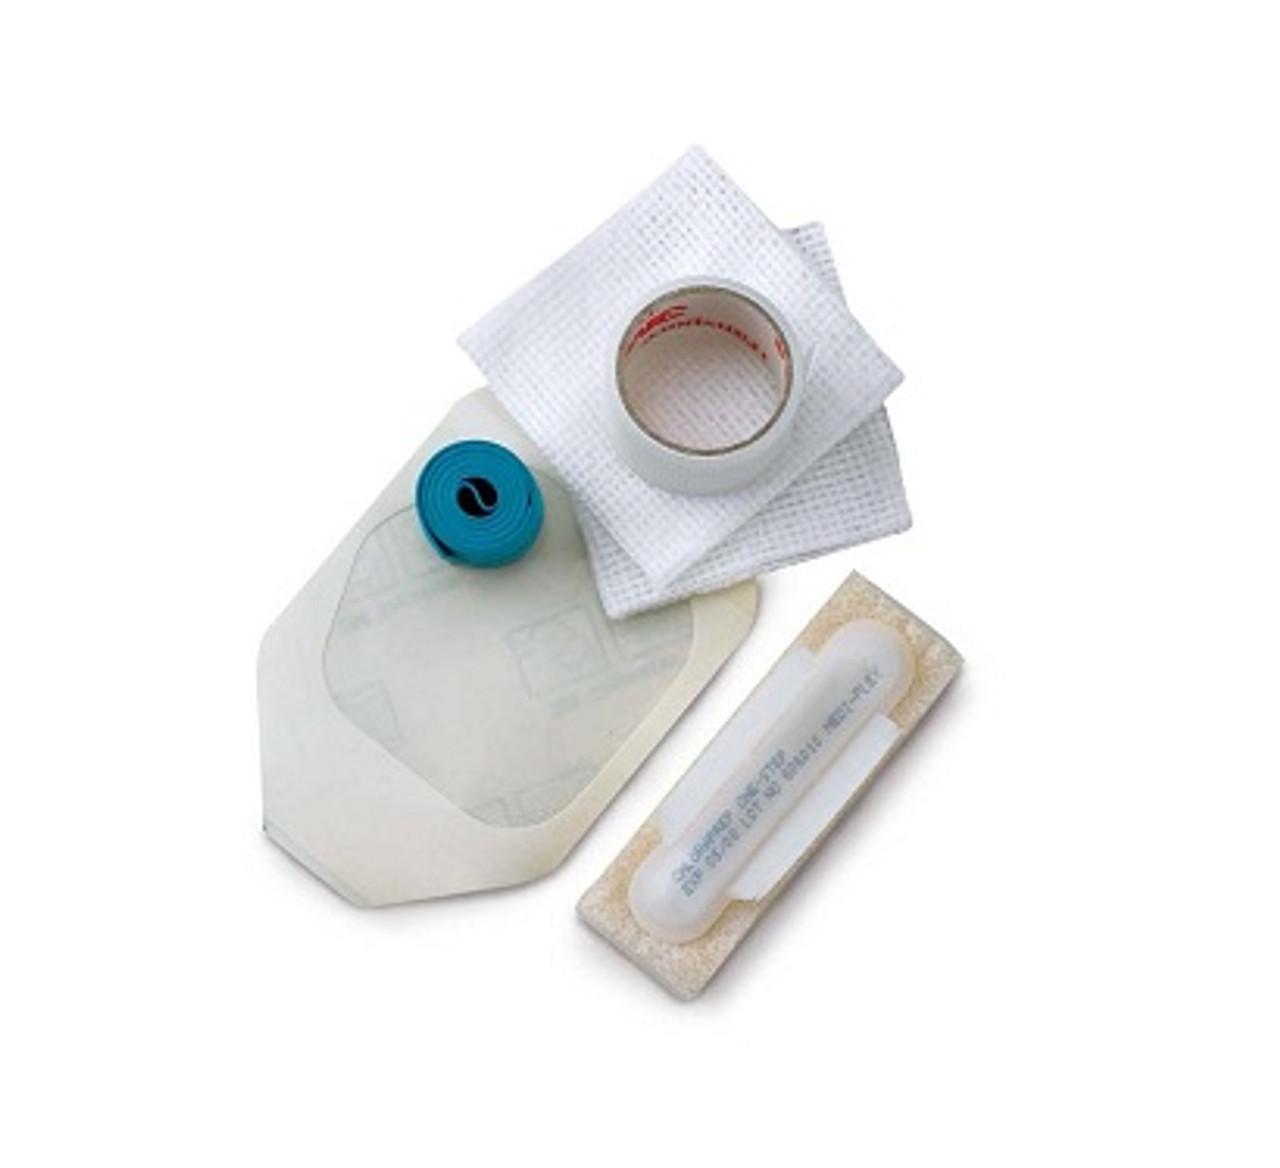 IV Start Kits with ChloraPrep and Tegaderm